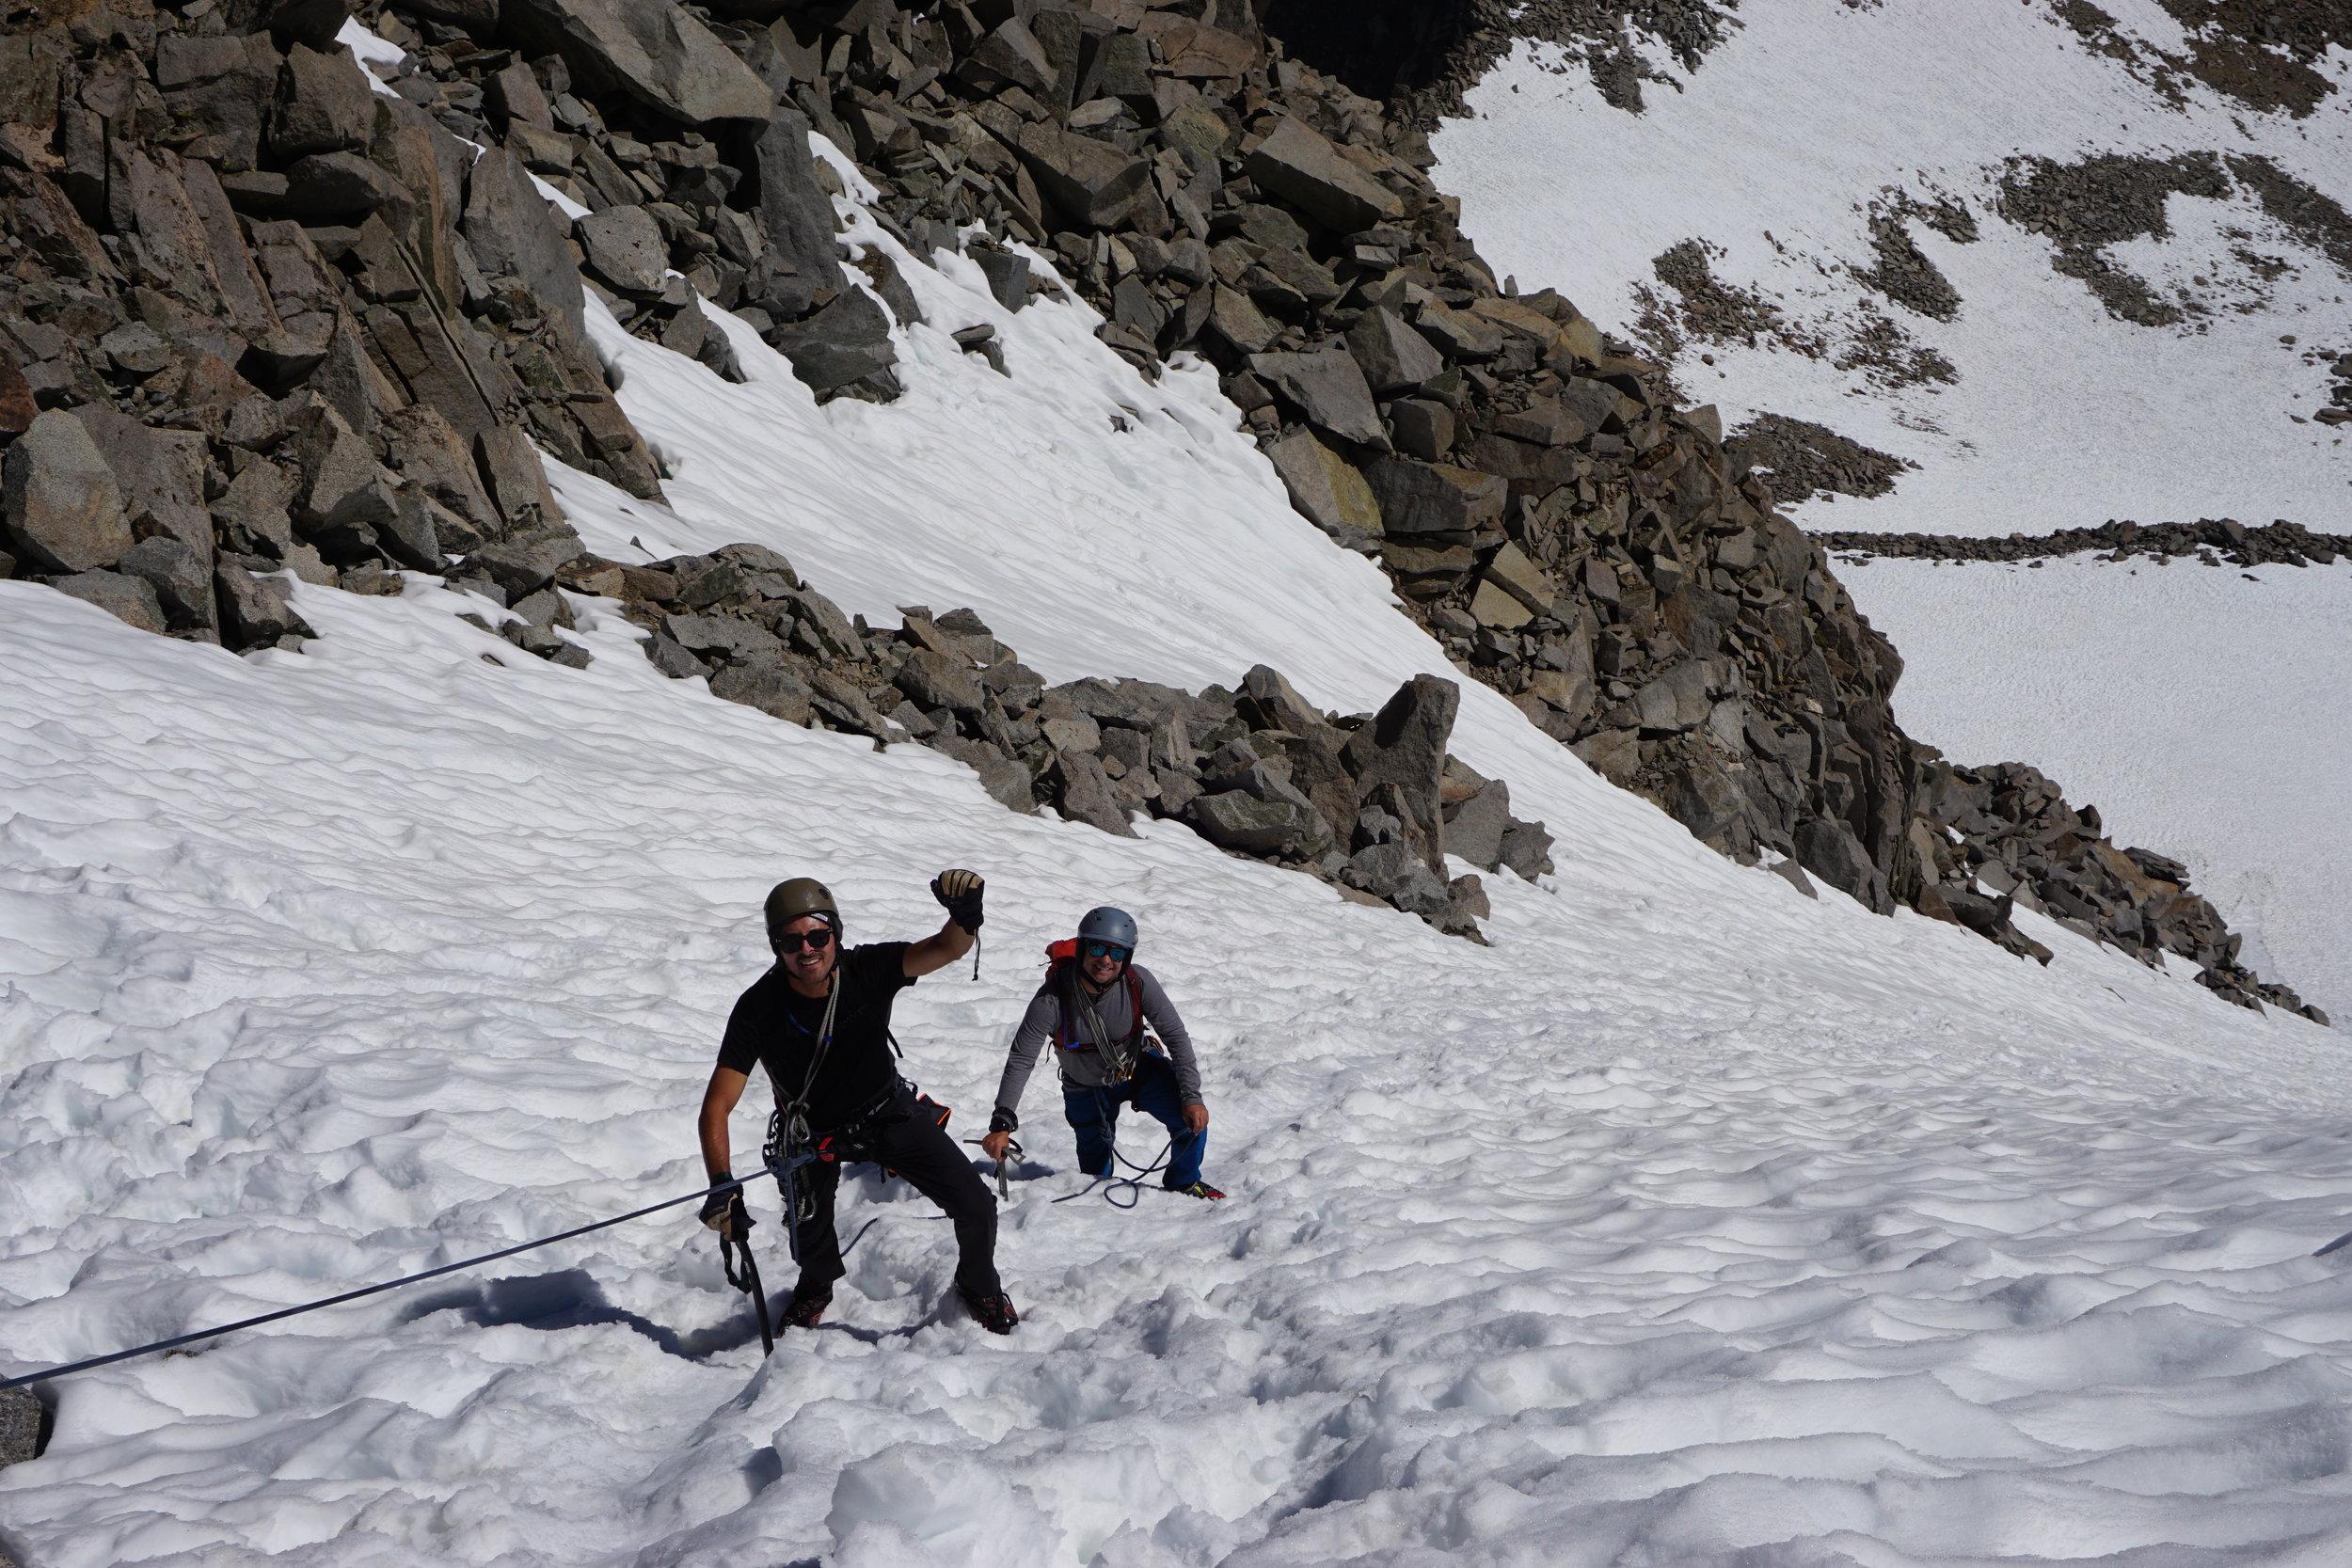 North Couloir L-Shape Couloir Mount Sill High Sierra Mountaineering